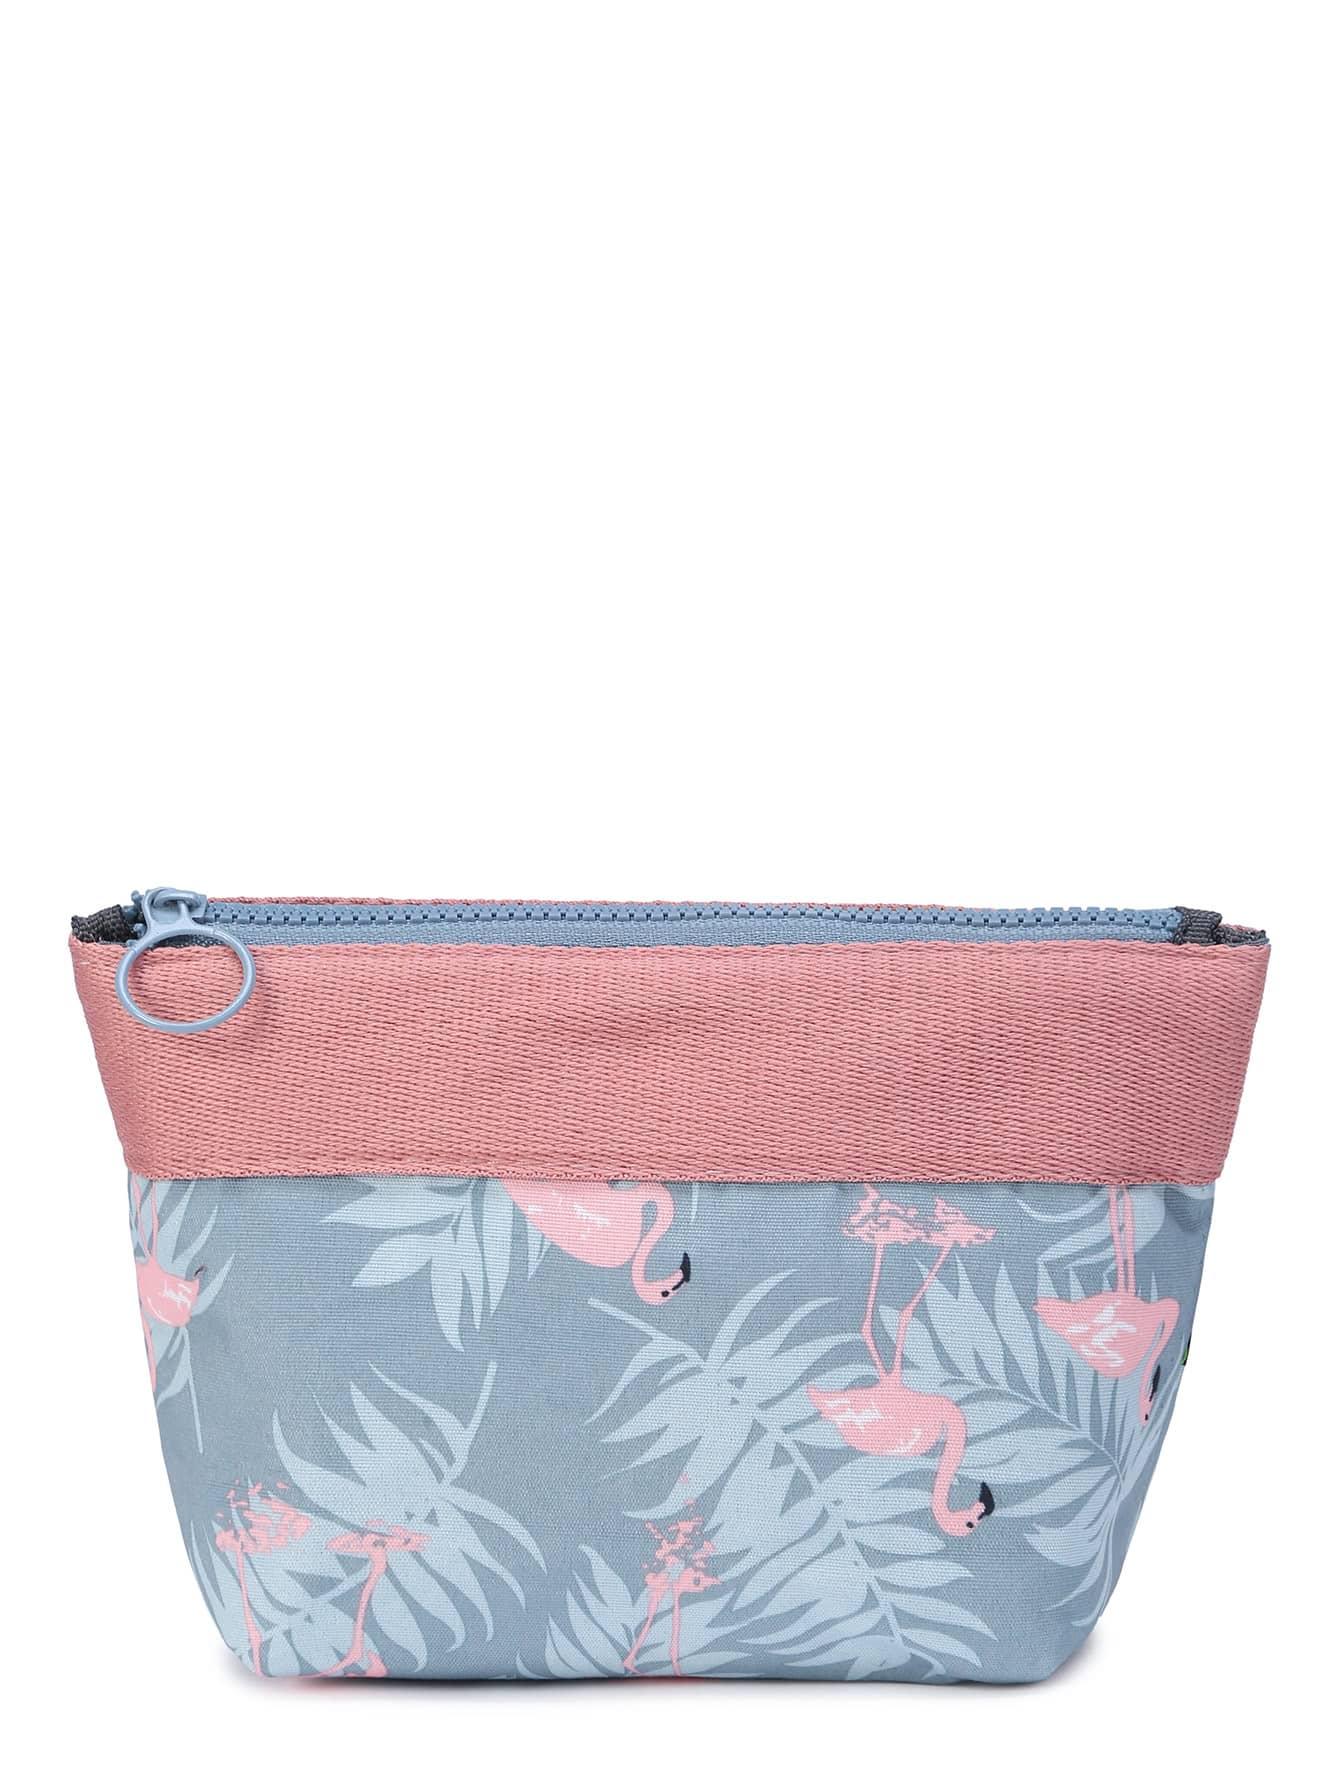 Flamingo And Leaf Print Makeup Bag